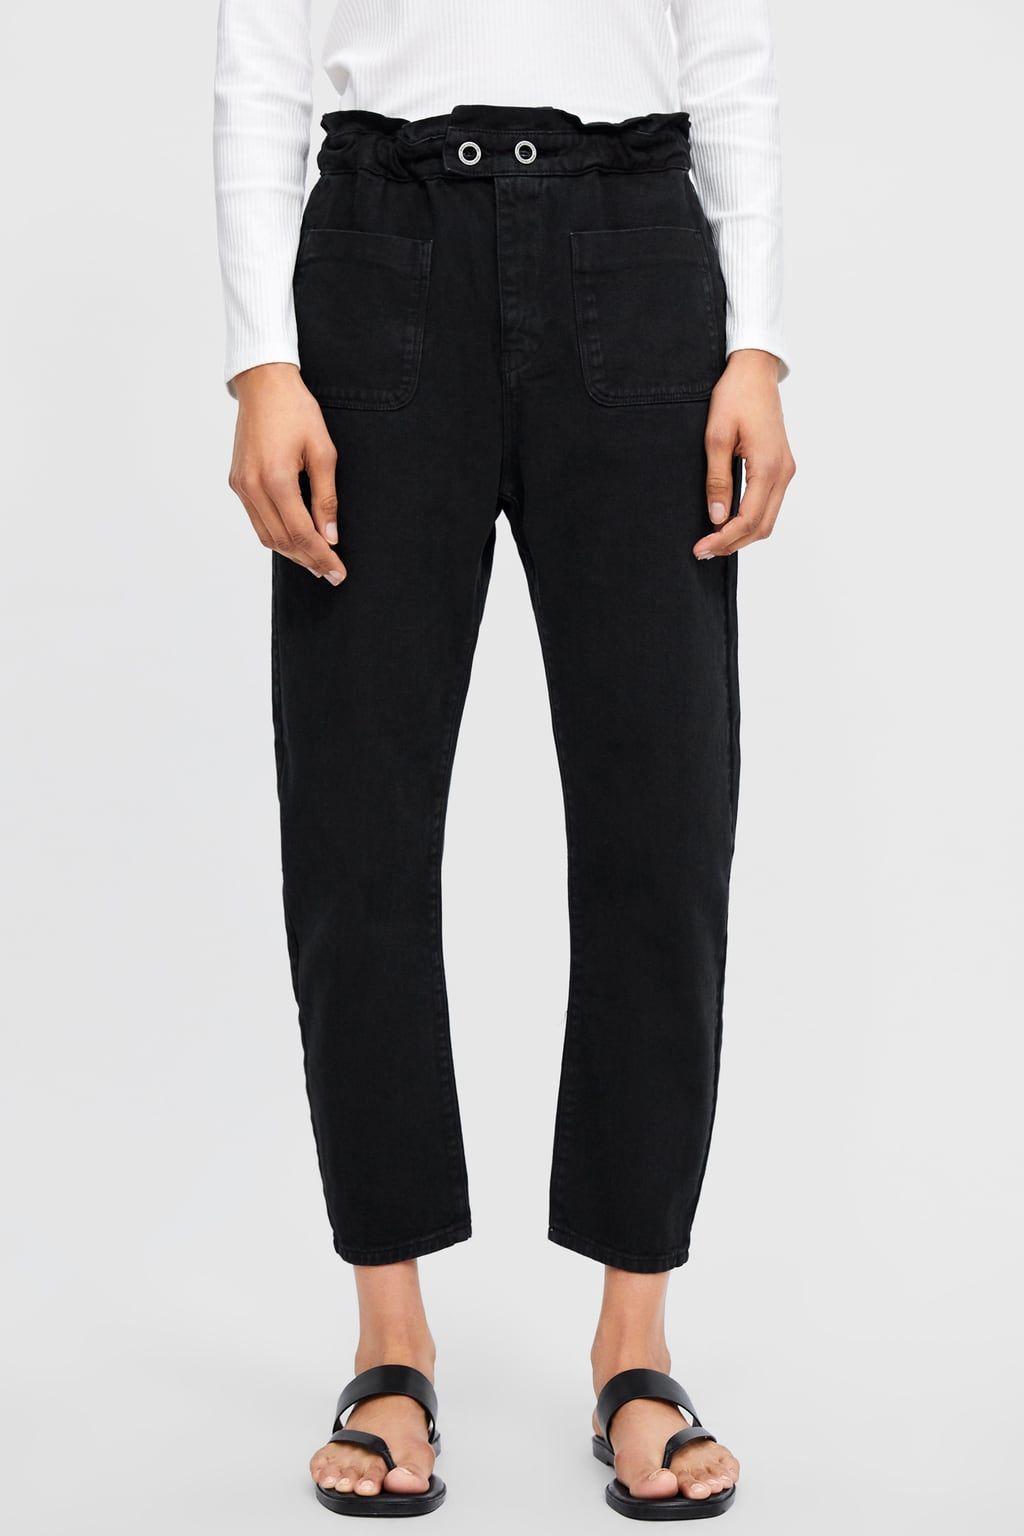 0752bb48 Z1975 baggy jeans | fashion in 2019 | Jeans, Pants, Zara